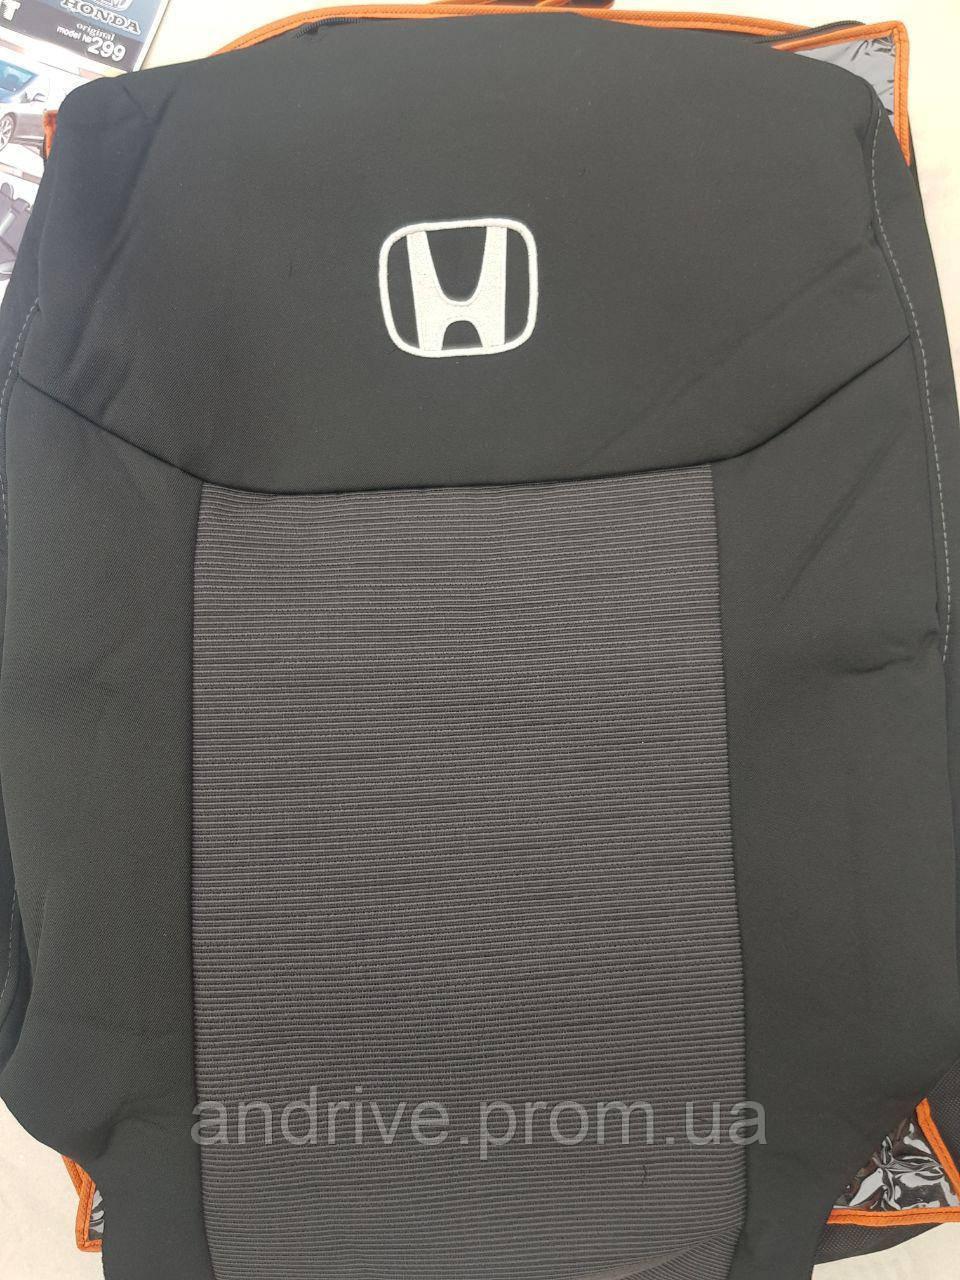 Авточехлы Honda Jazz ІІ с 2008 г